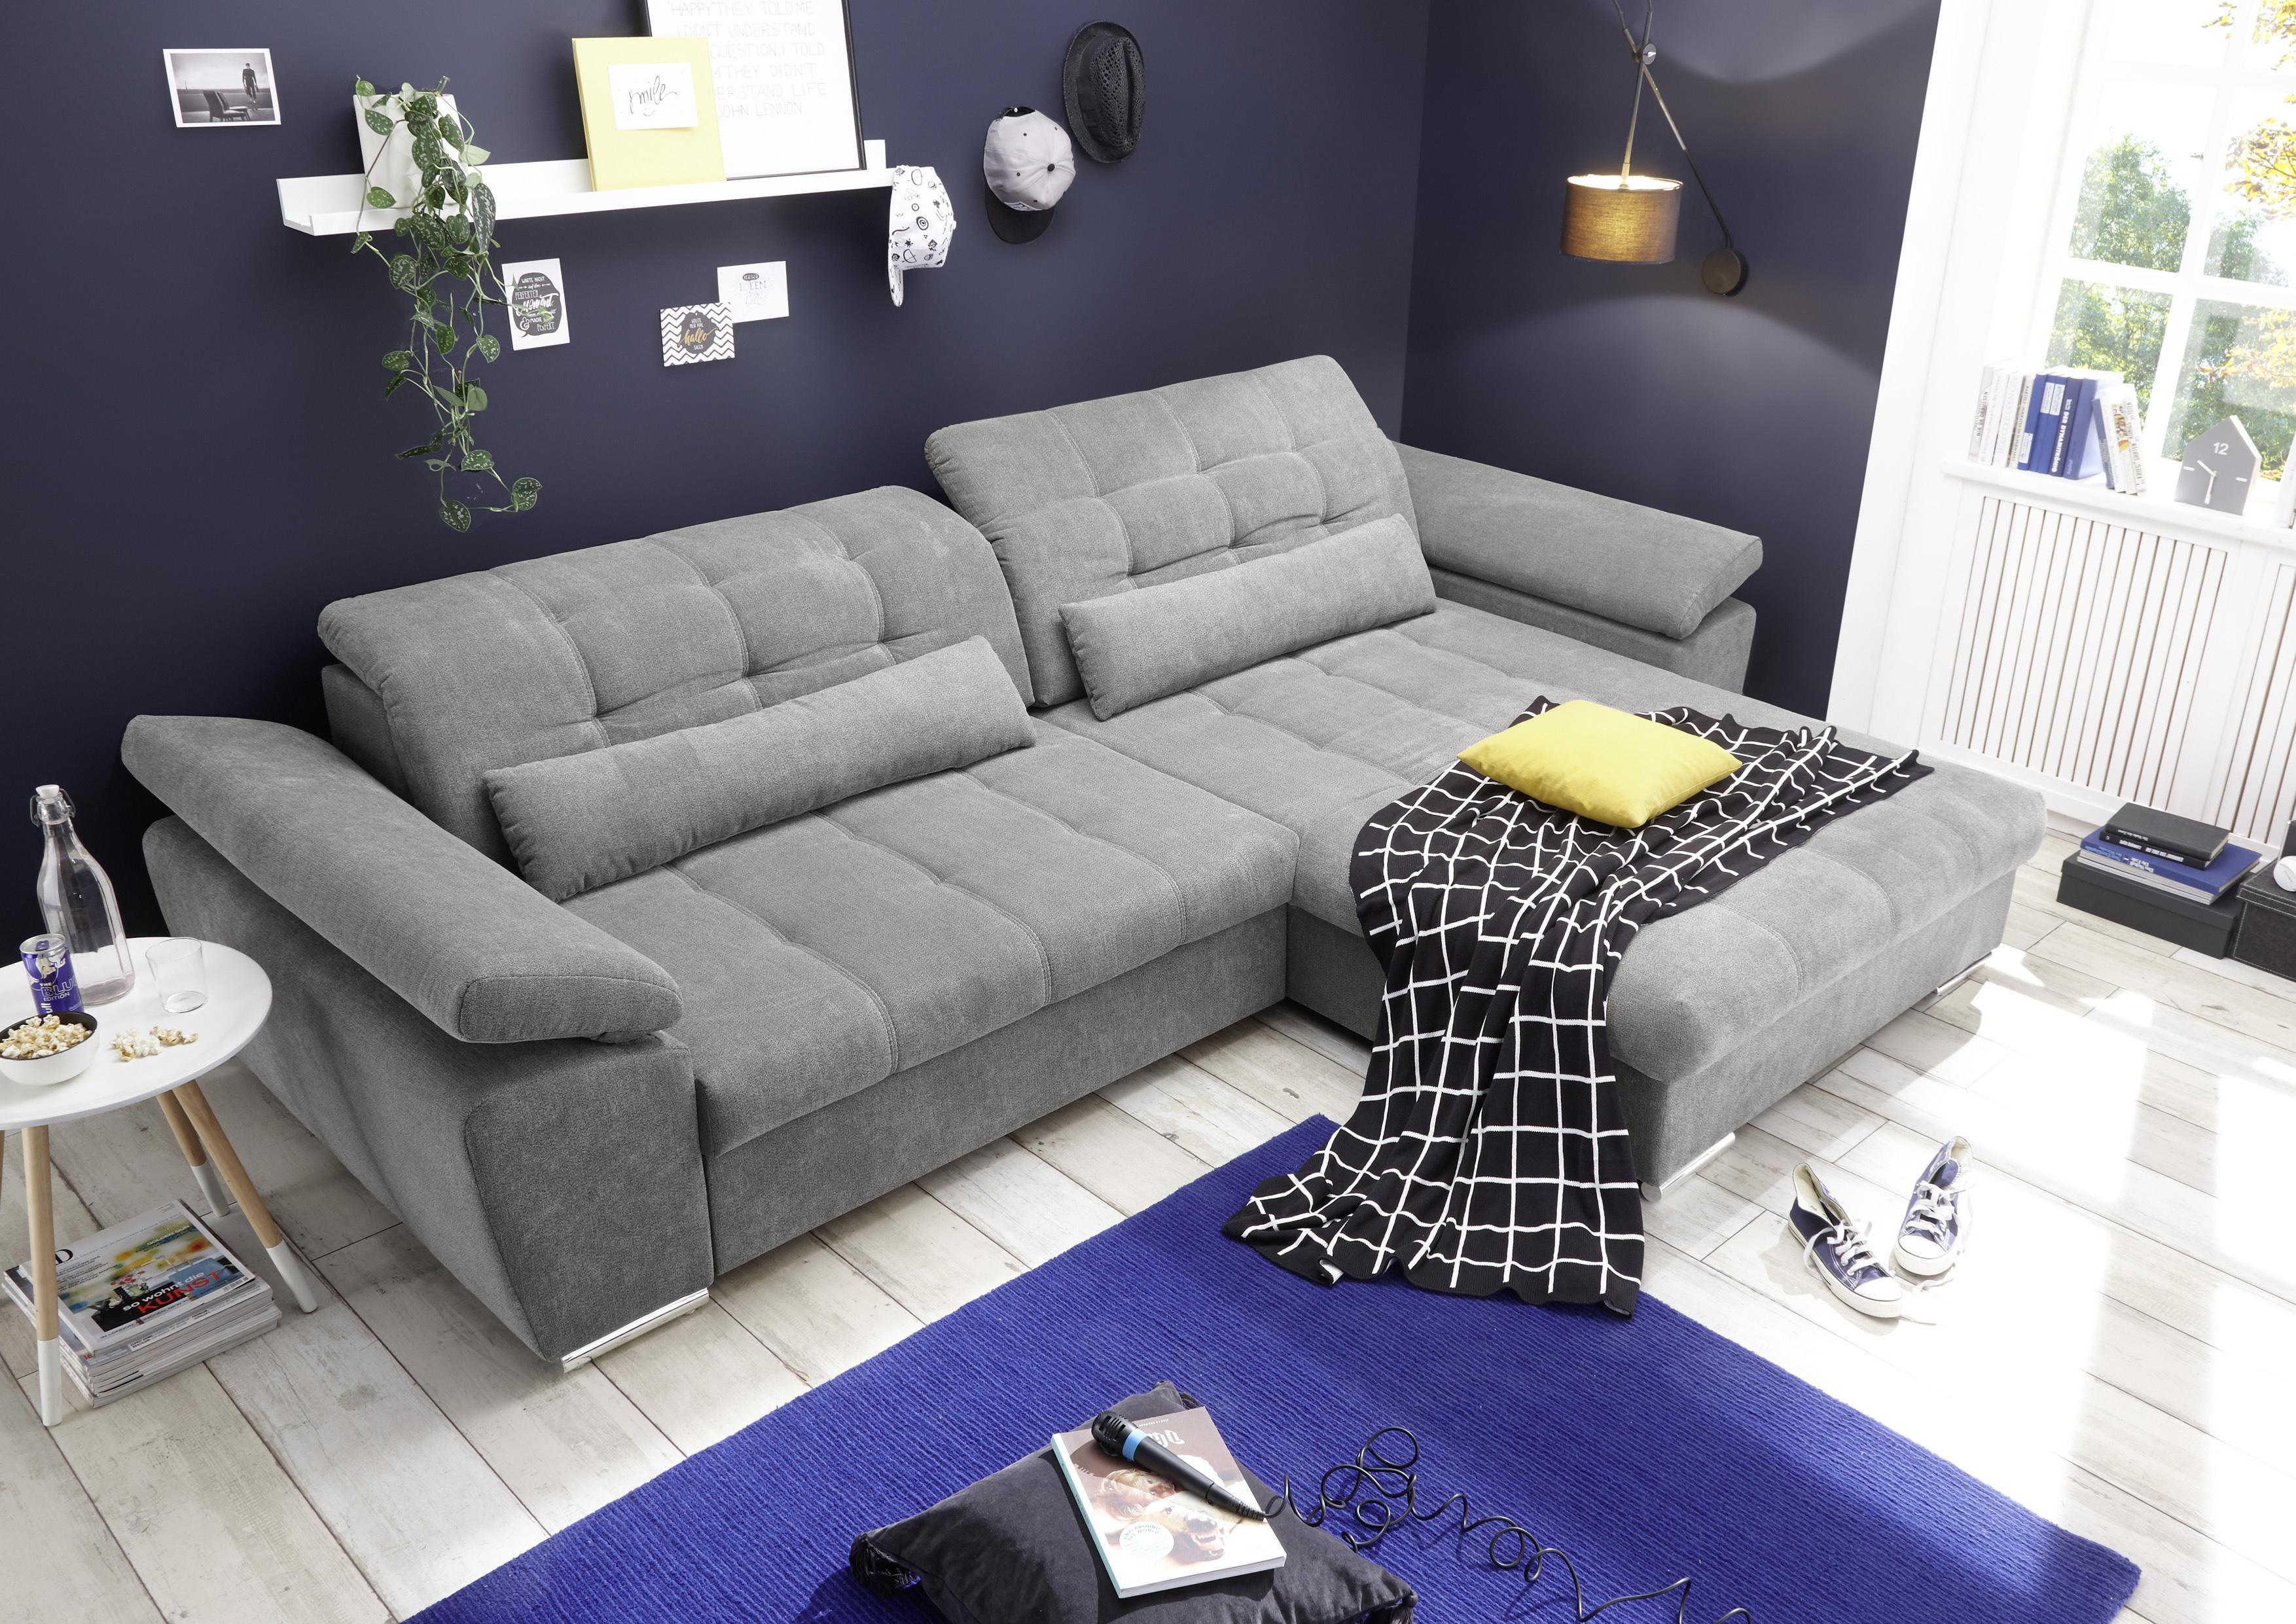 Details Zu Ecksofa Couch Casa Schlafcouch Schlafsofa Funktionssofa Ausziehbar Grau L Form